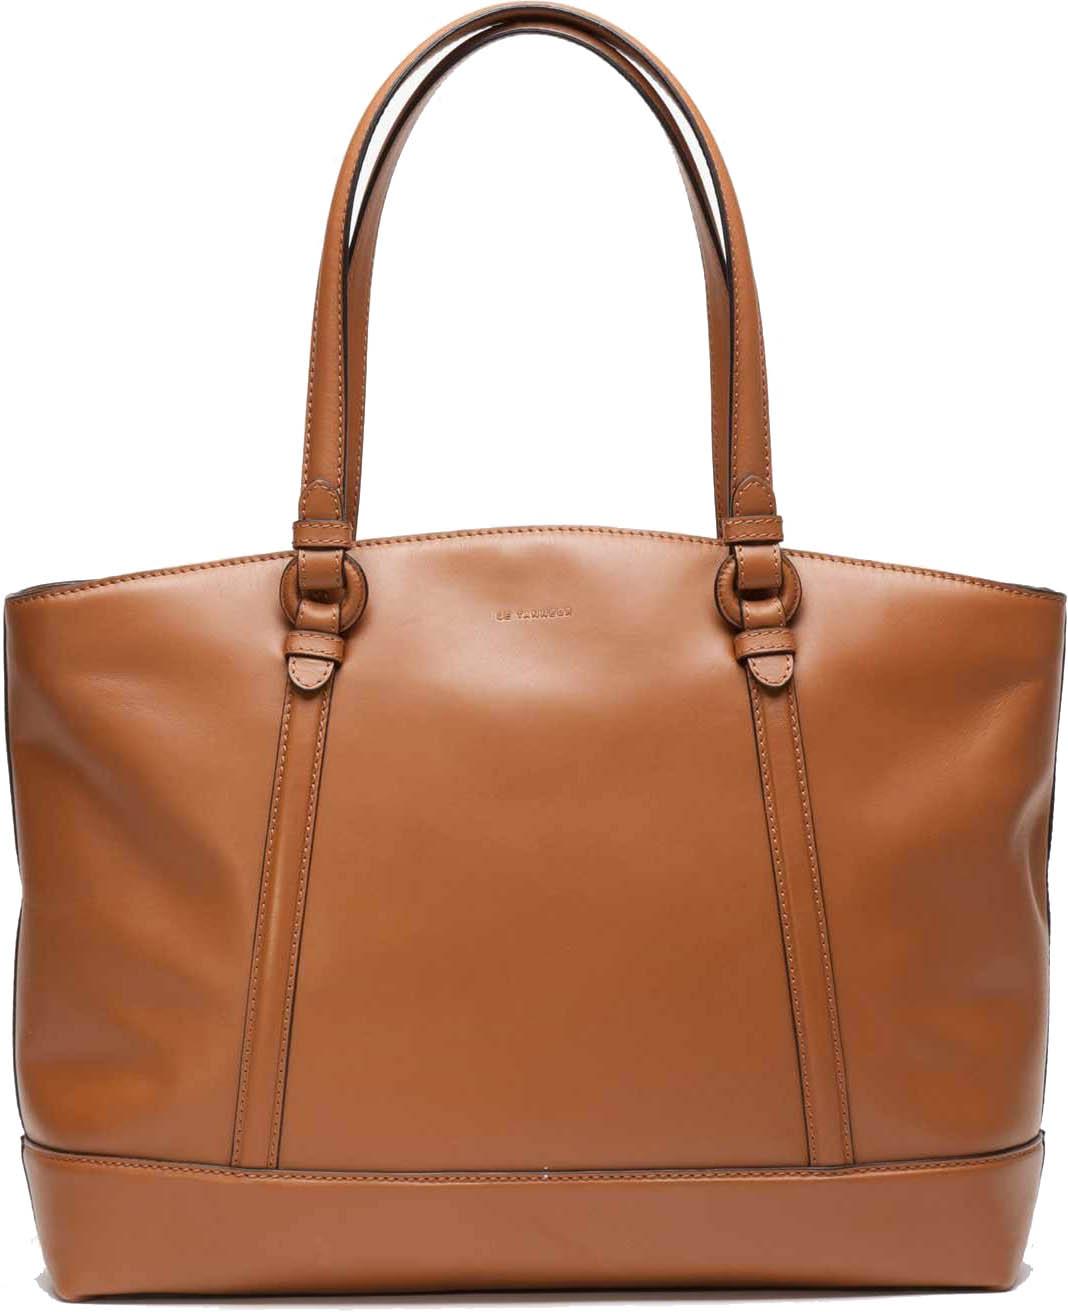 sac cabas porte epaule manon cuir et sac main le tanneur womancorner. Black Bedroom Furniture Sets. Home Design Ideas